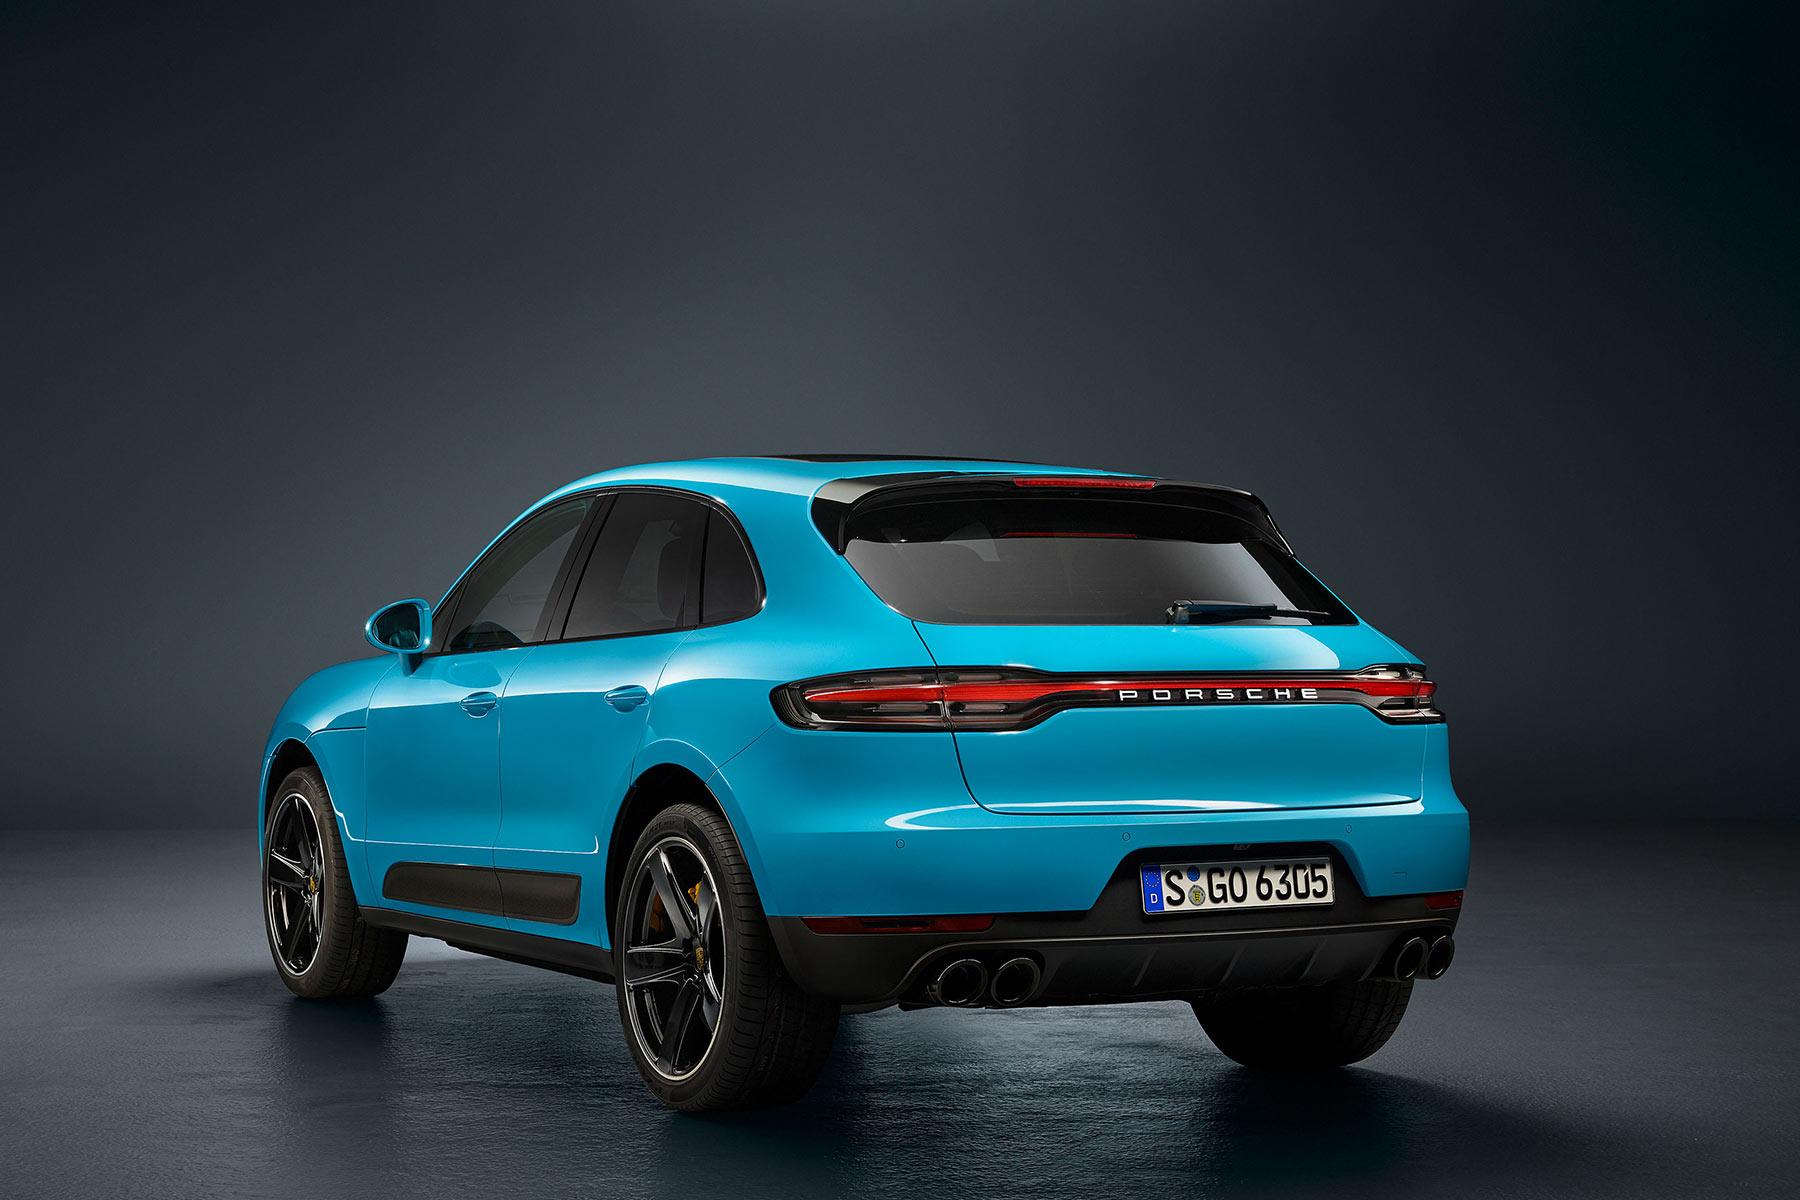 2019 Porsche Macan Facelift Paris Motor Show